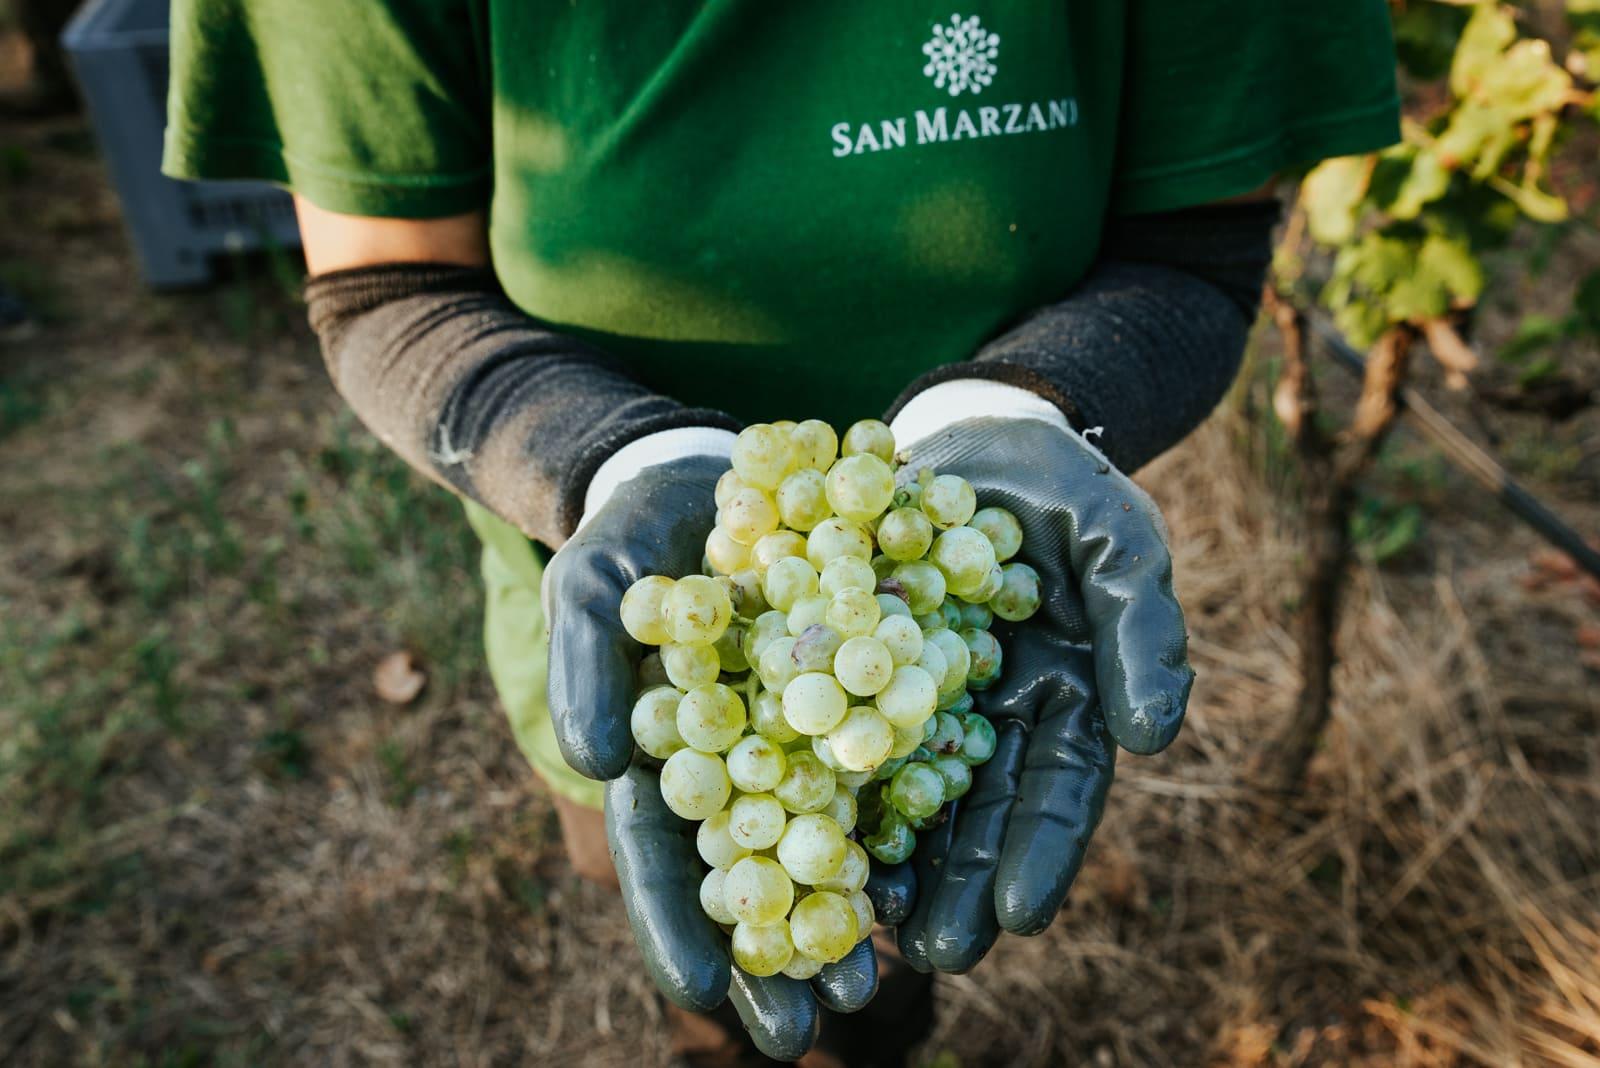 Grape harvest 2019: an overview